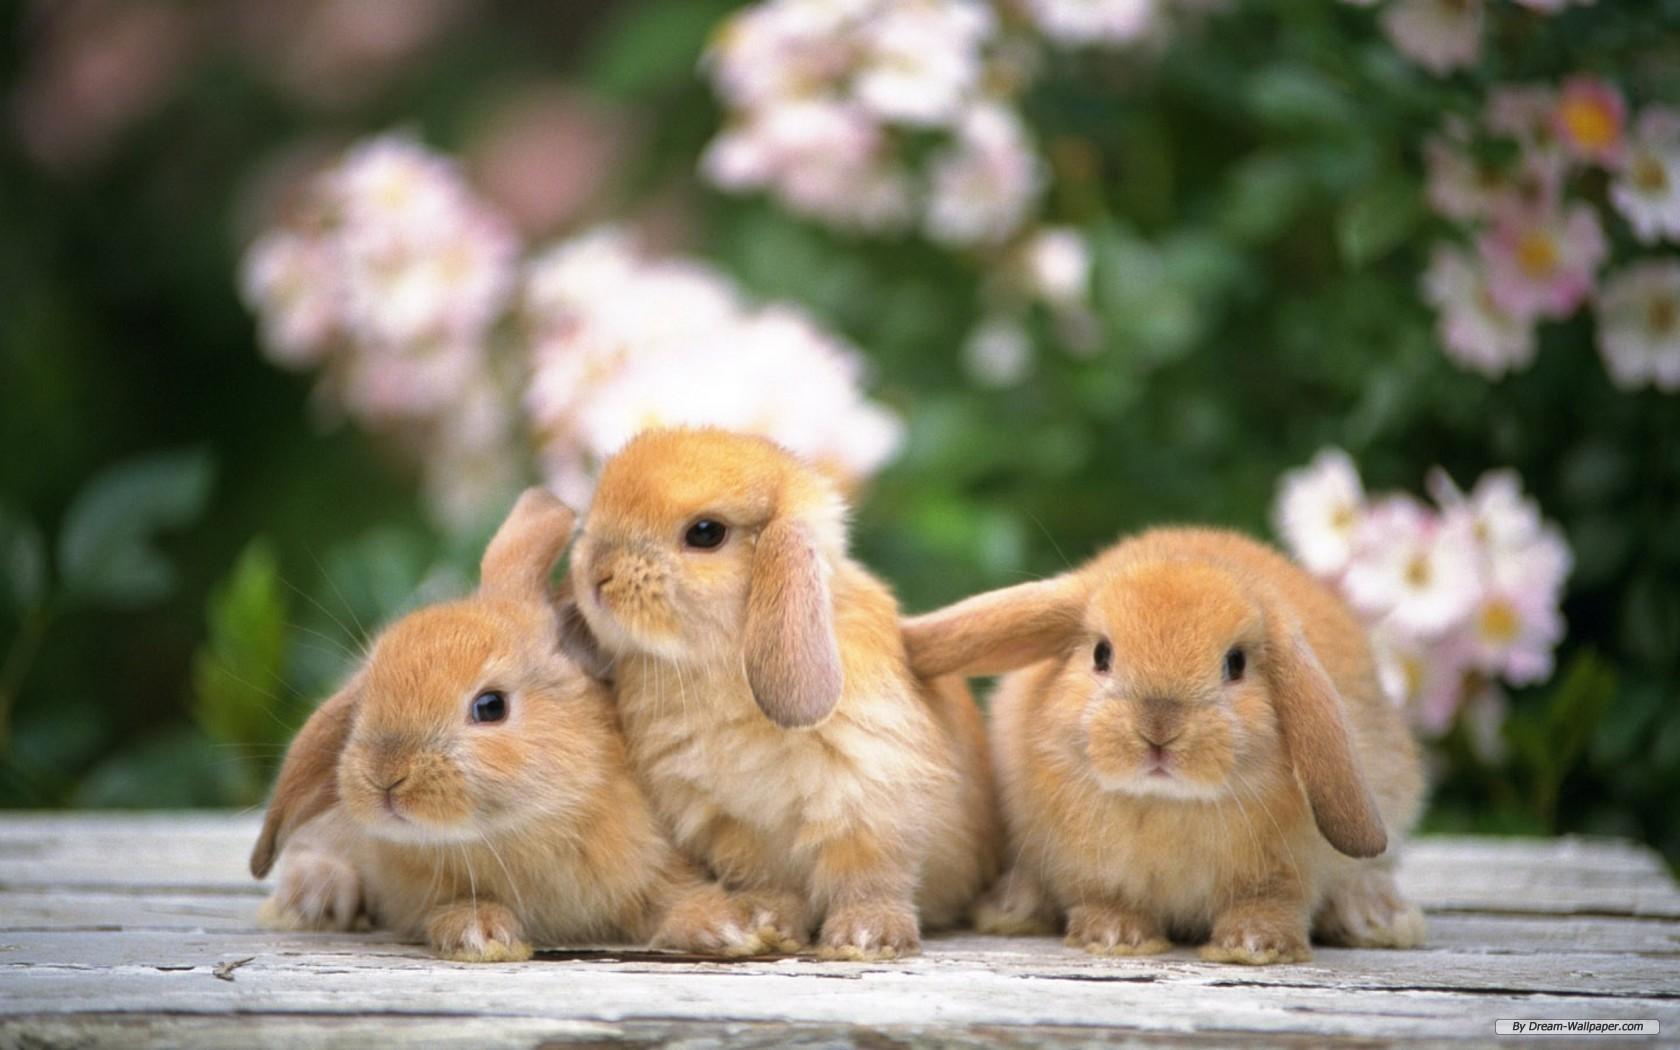 Rabbit Wallpaper 12